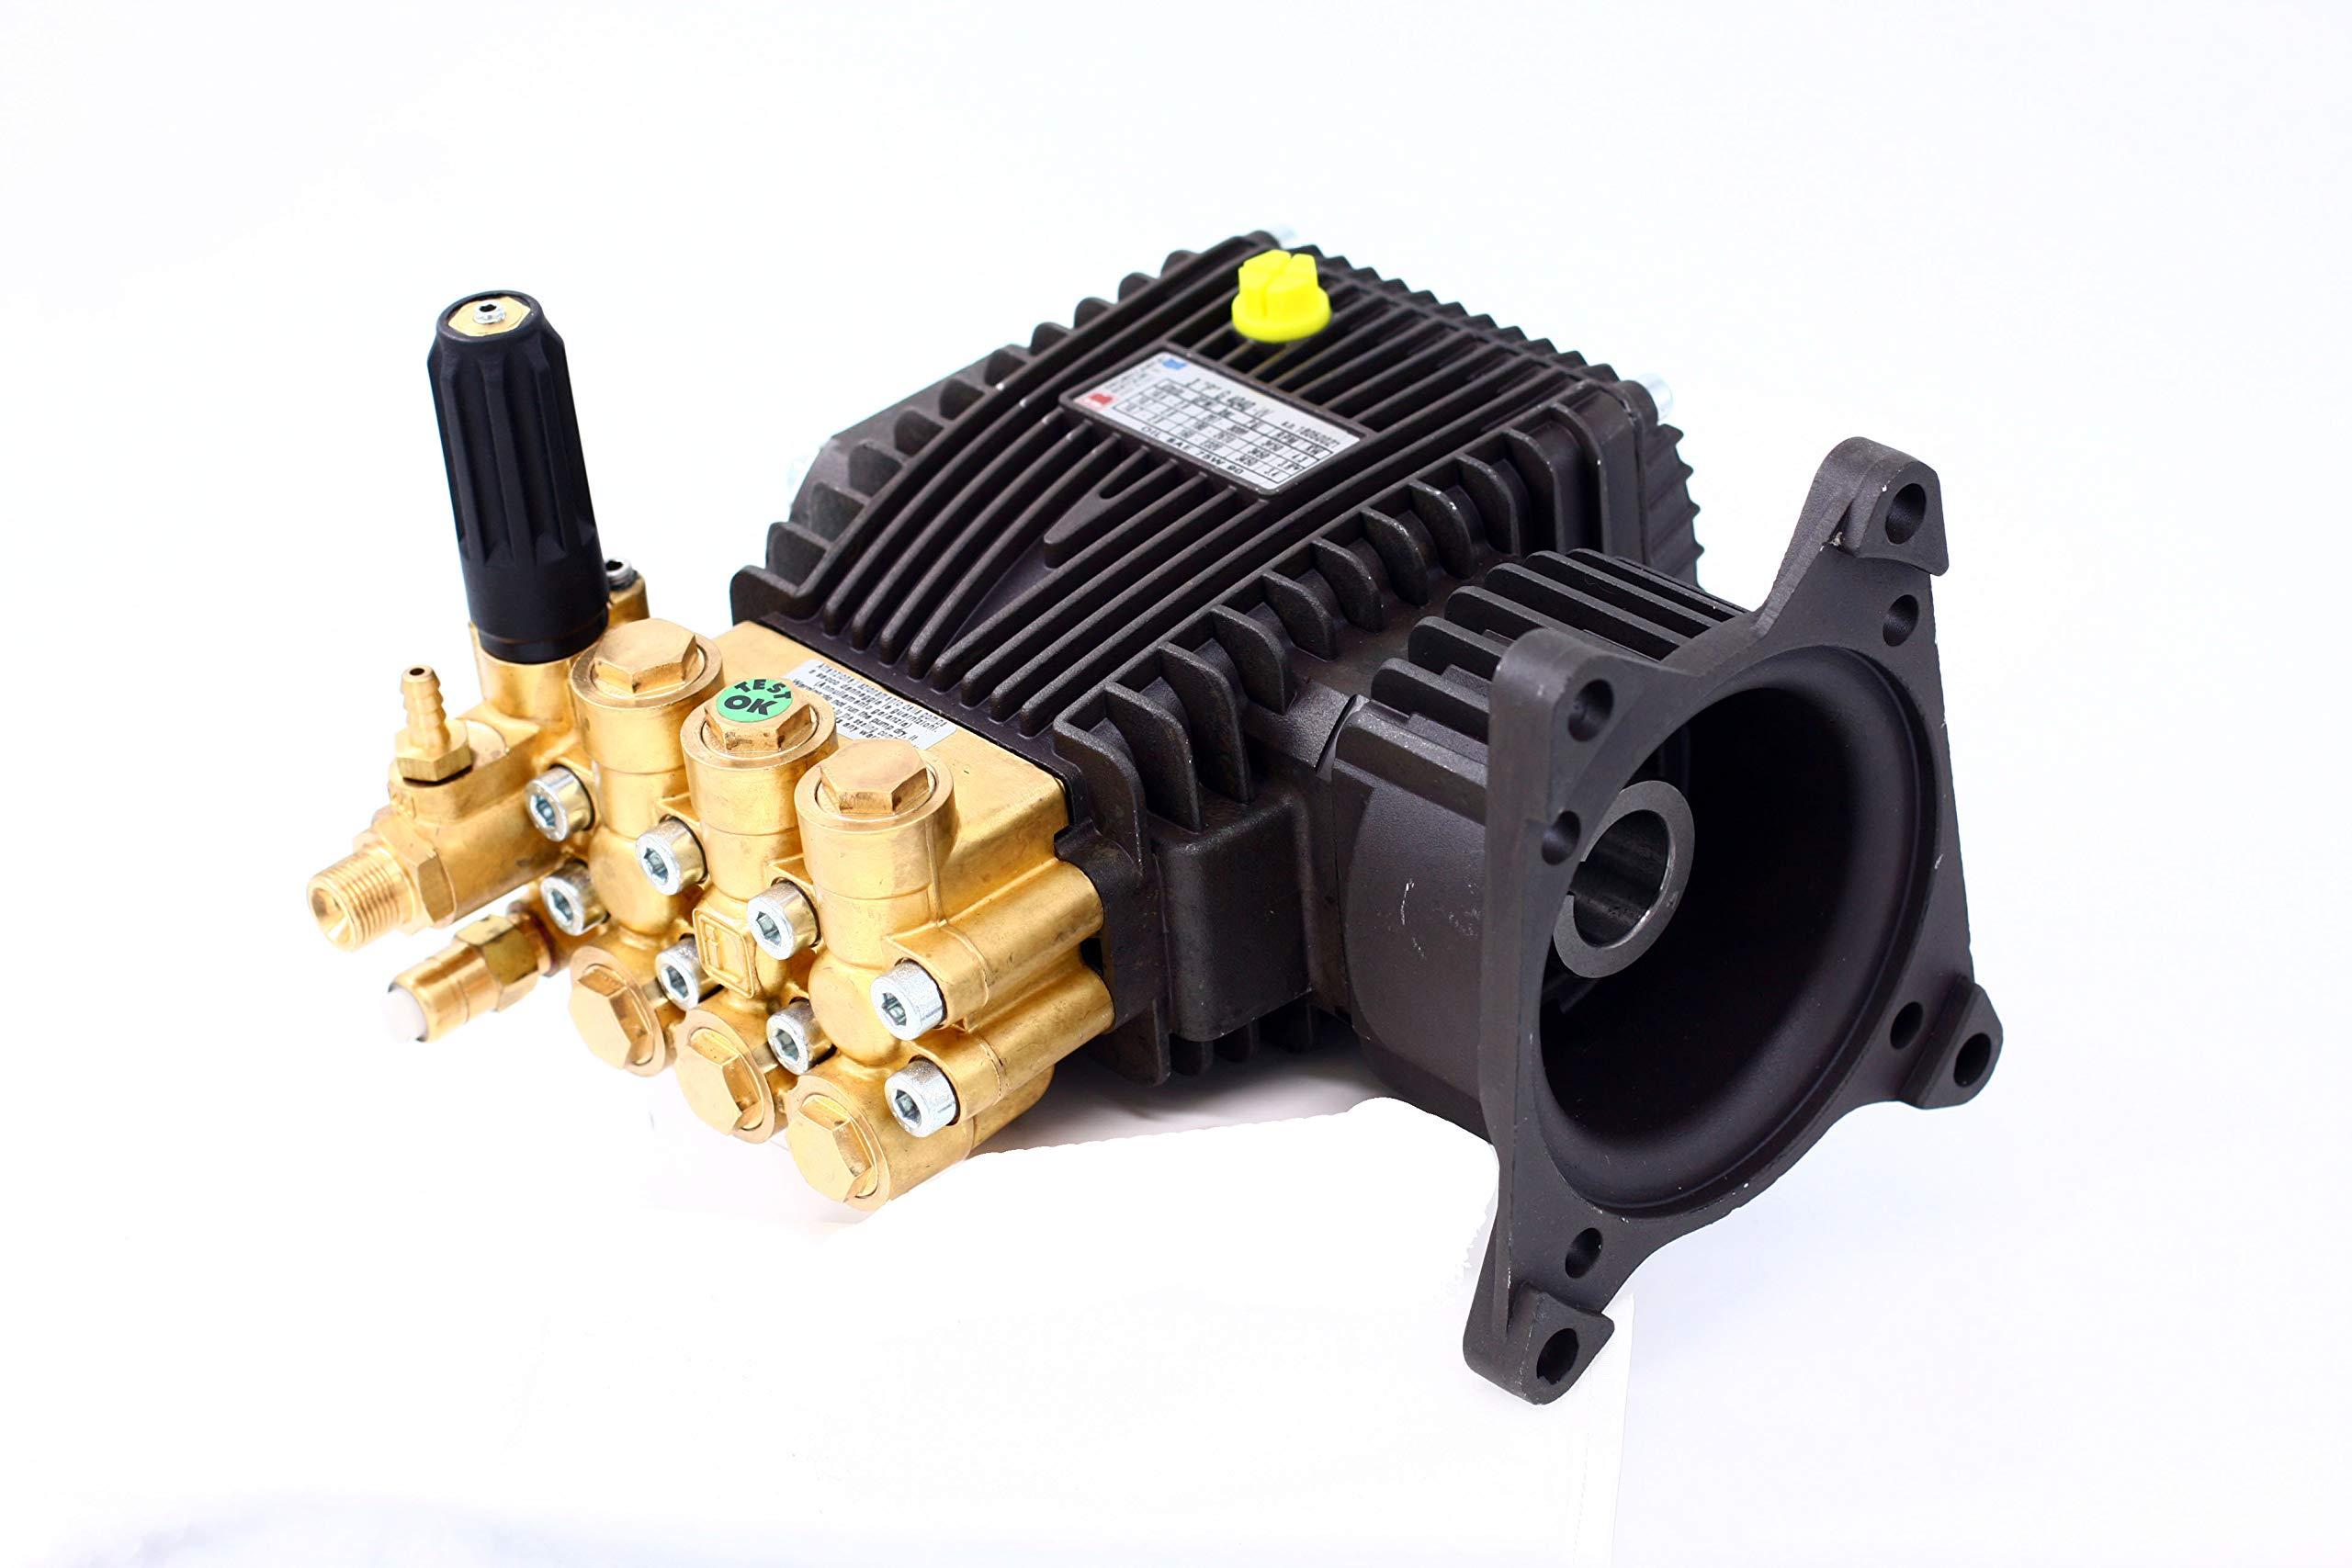 Bertolini Pressure Washer Pump 4060 psi @ 4.3gpm Includes Unloader Valve by Bertolini